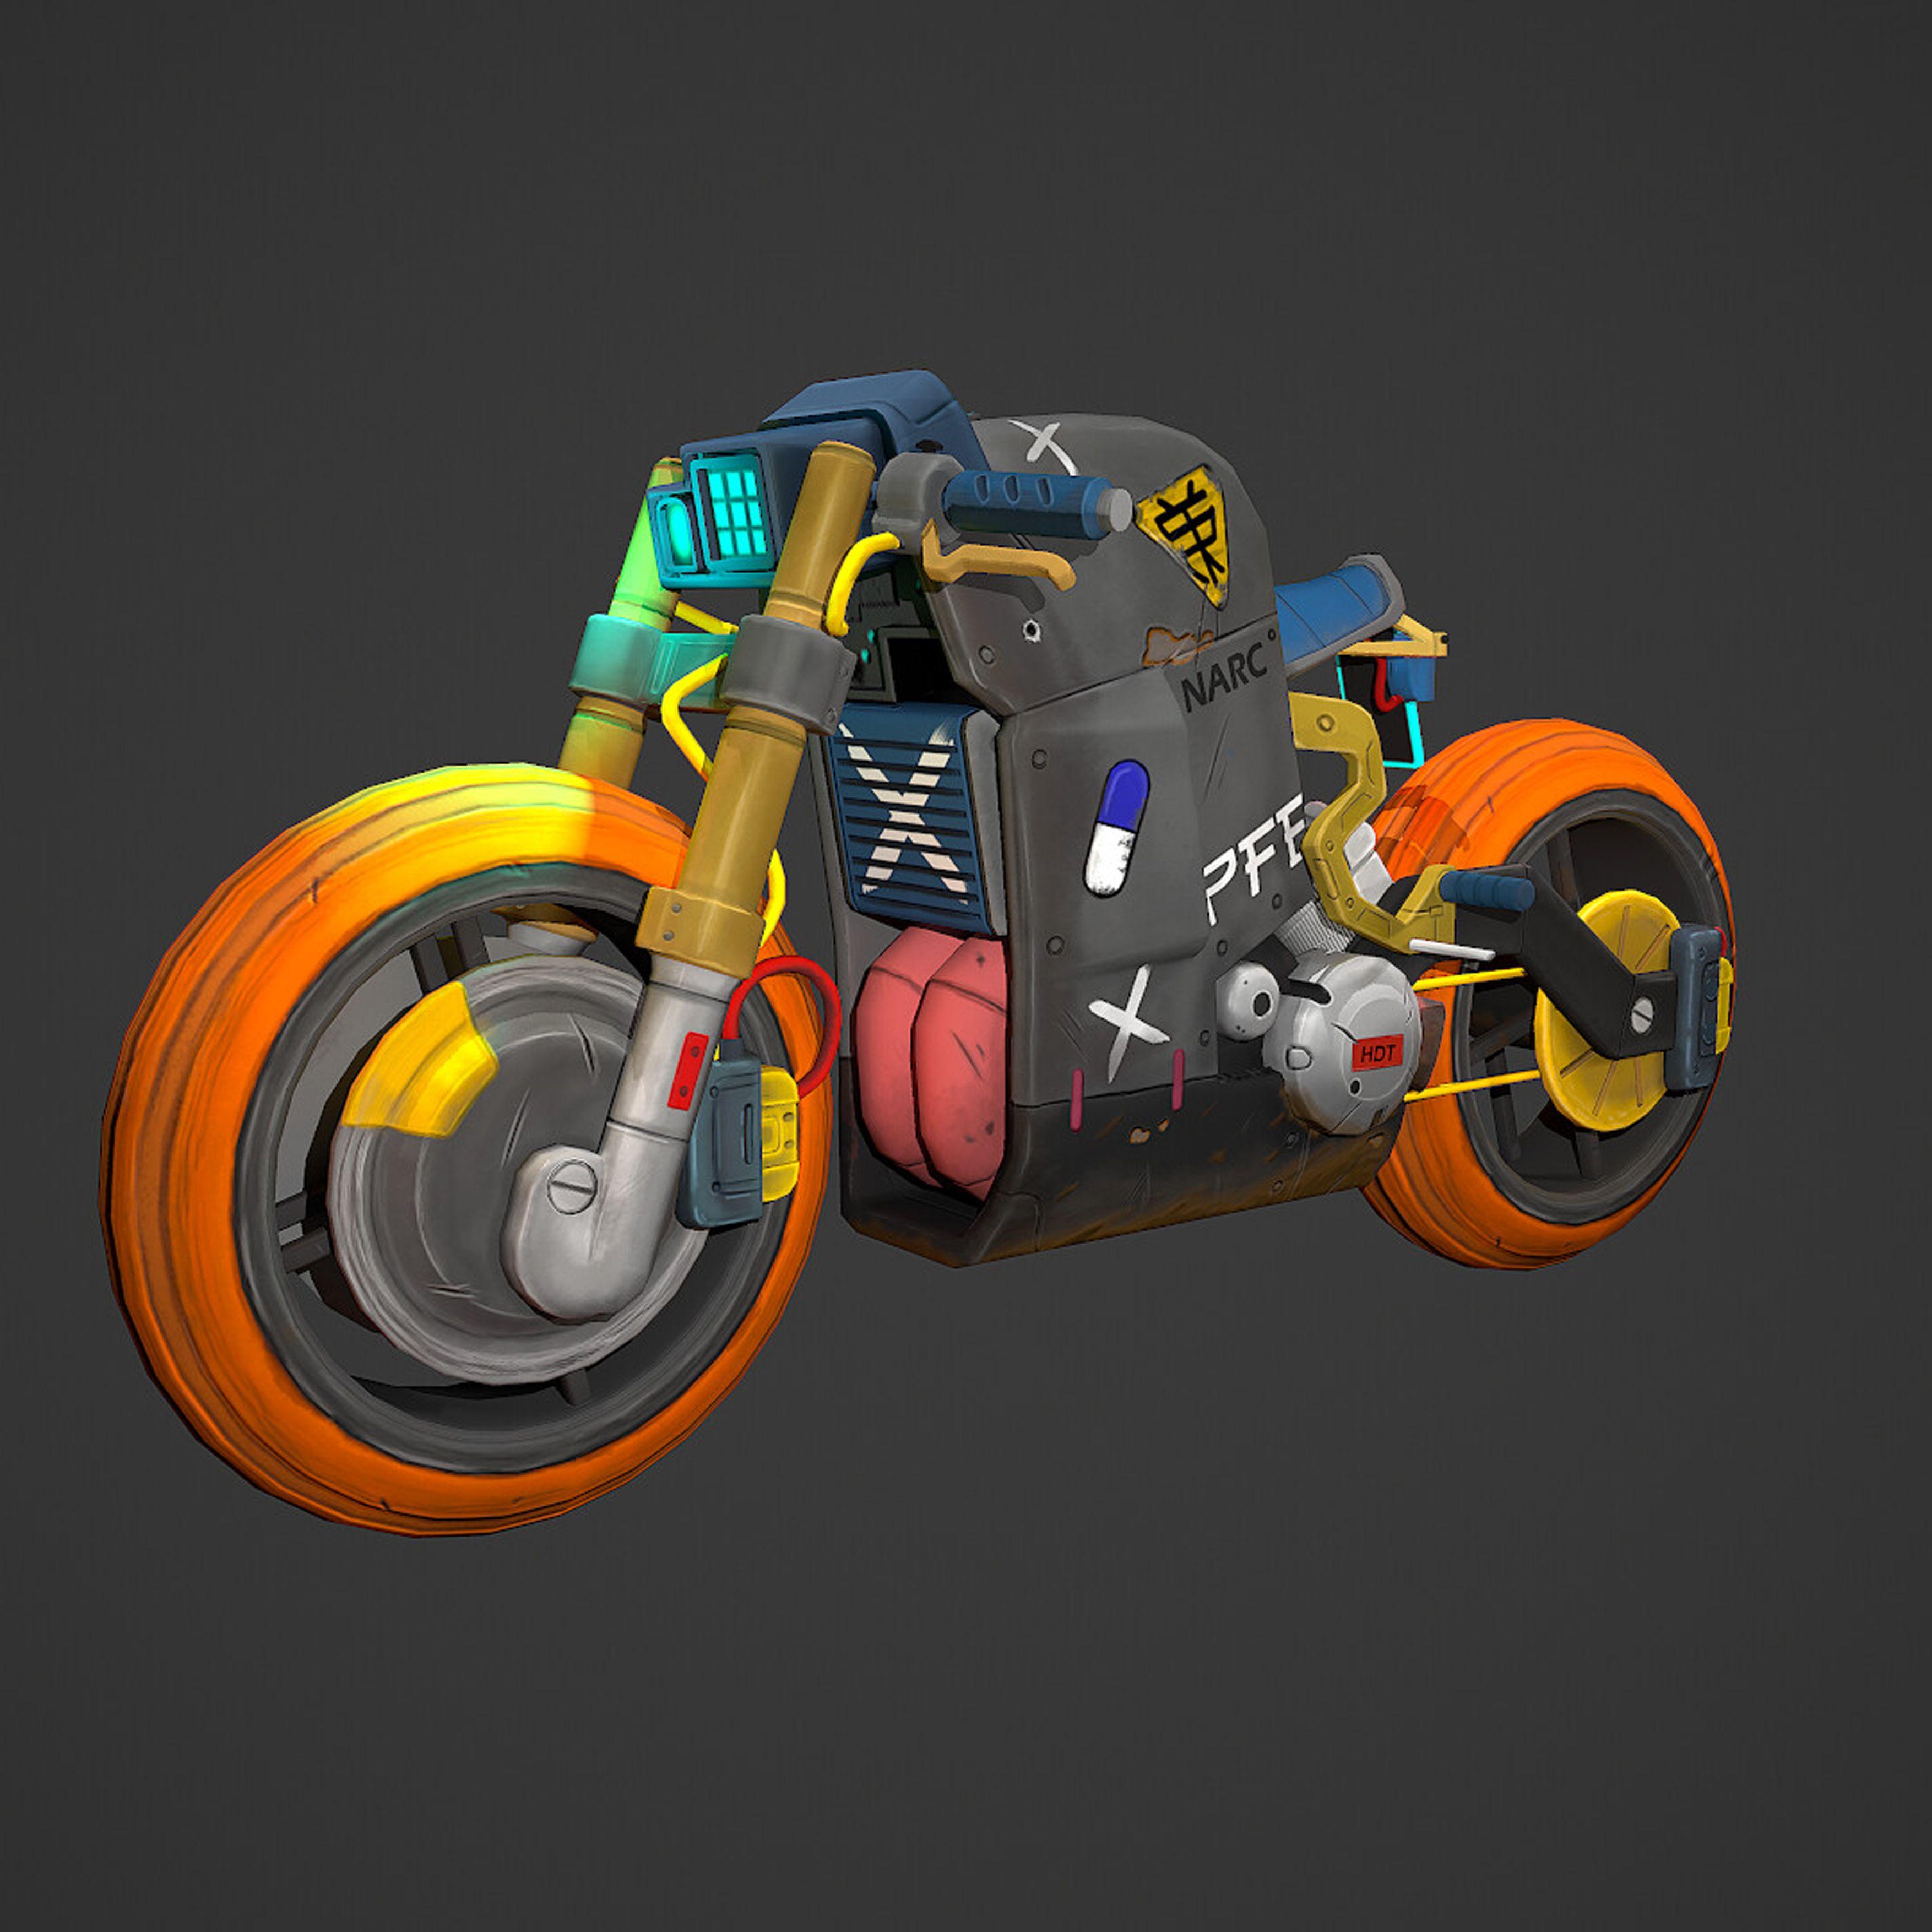 11+ Cyberpunk motorcycle ideas